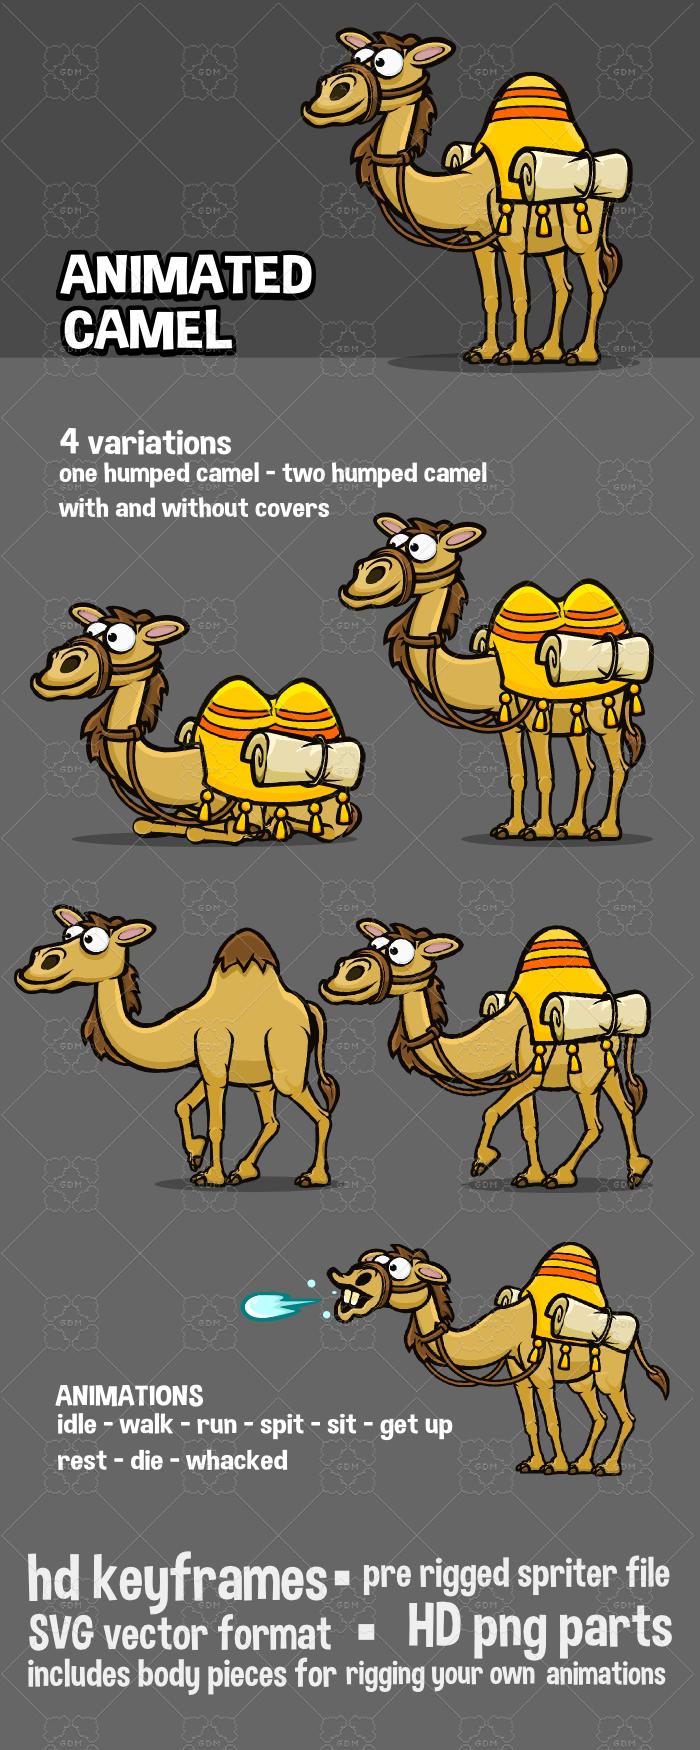 Animated camel cartoon sprite